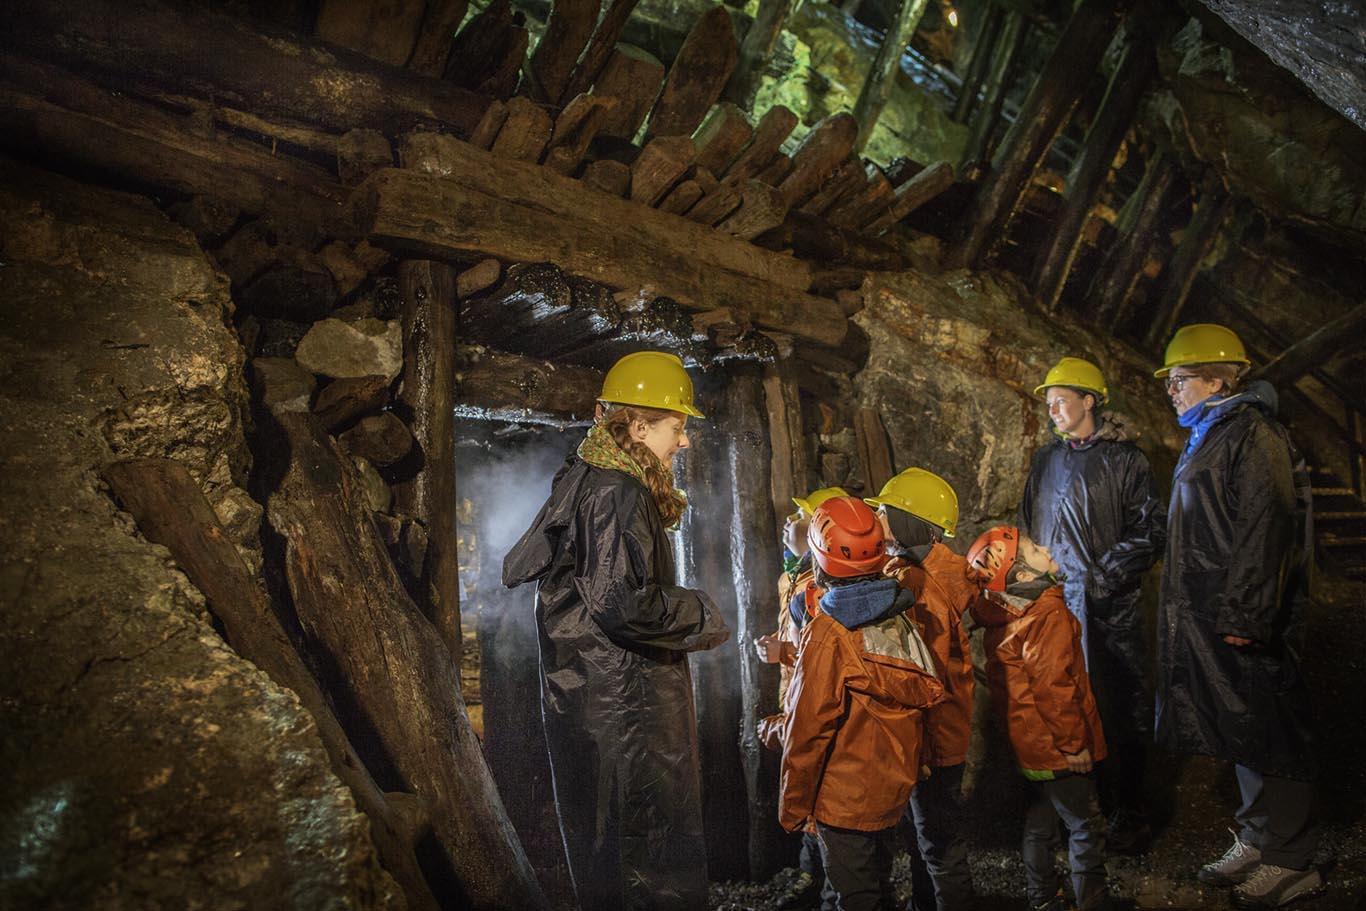 Miniera dell'Erdemolo<br /> Gruab va Hardimbl